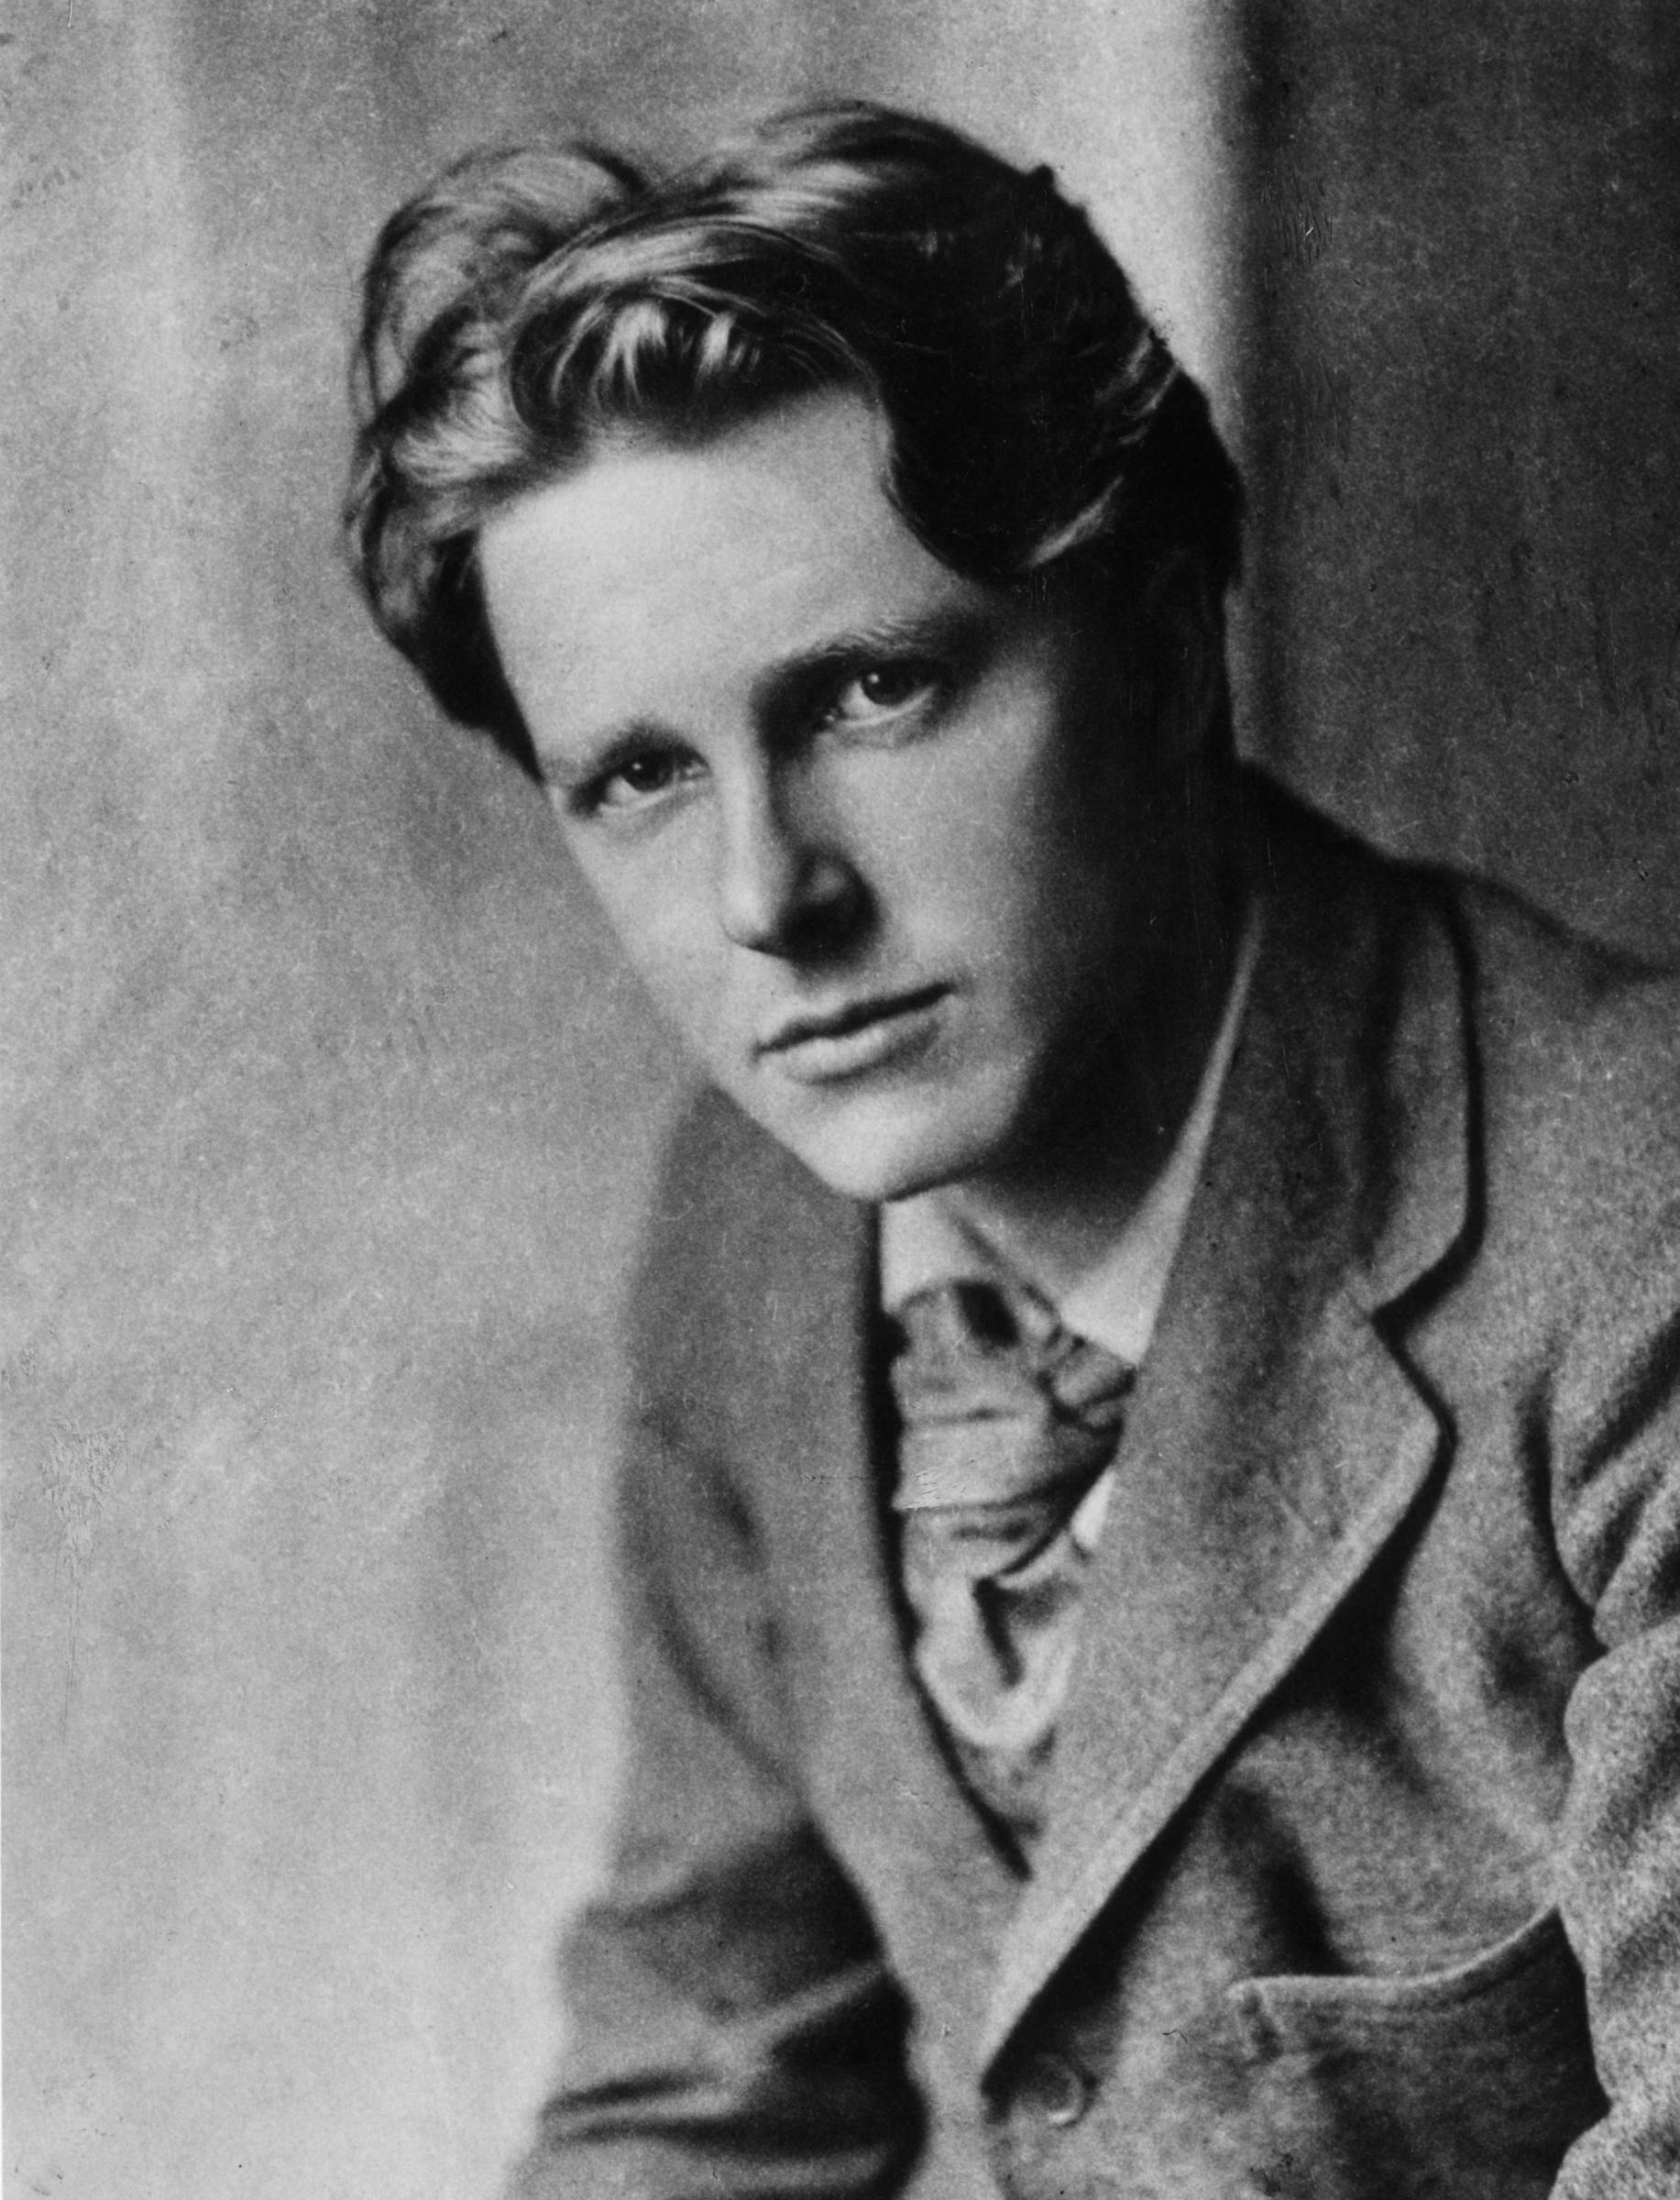 Rupert Brooke, pictured in around 1913.